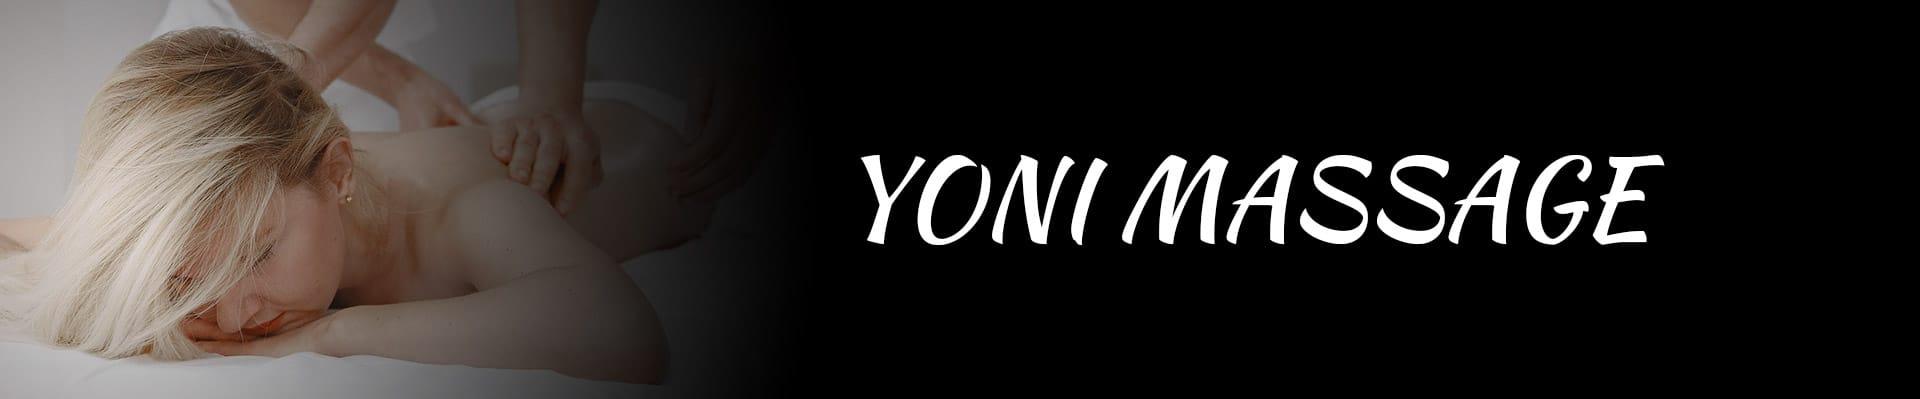 best yoni massage in singapore